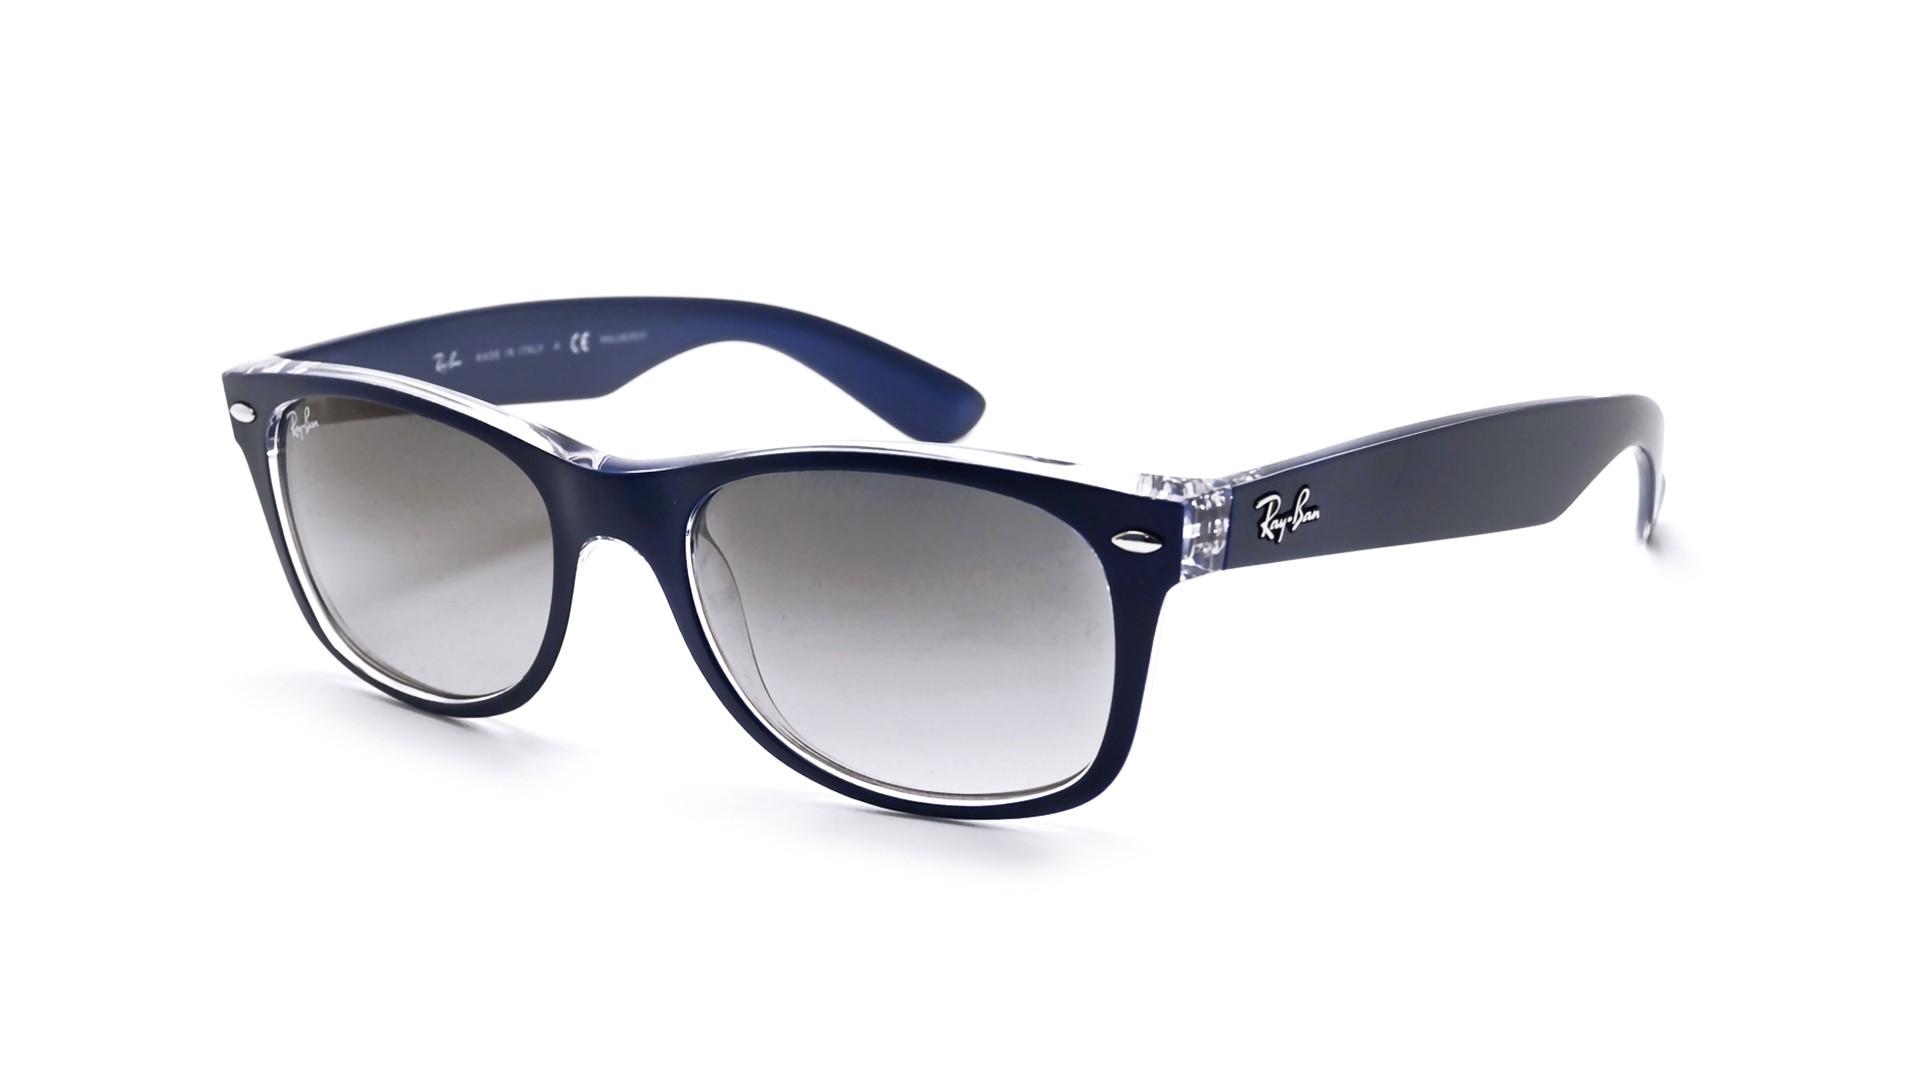 105004bd9bb Sunglasses Ray-Ban New Wayfarer Blue RB2132 6053 71 55-18 Large Gradient